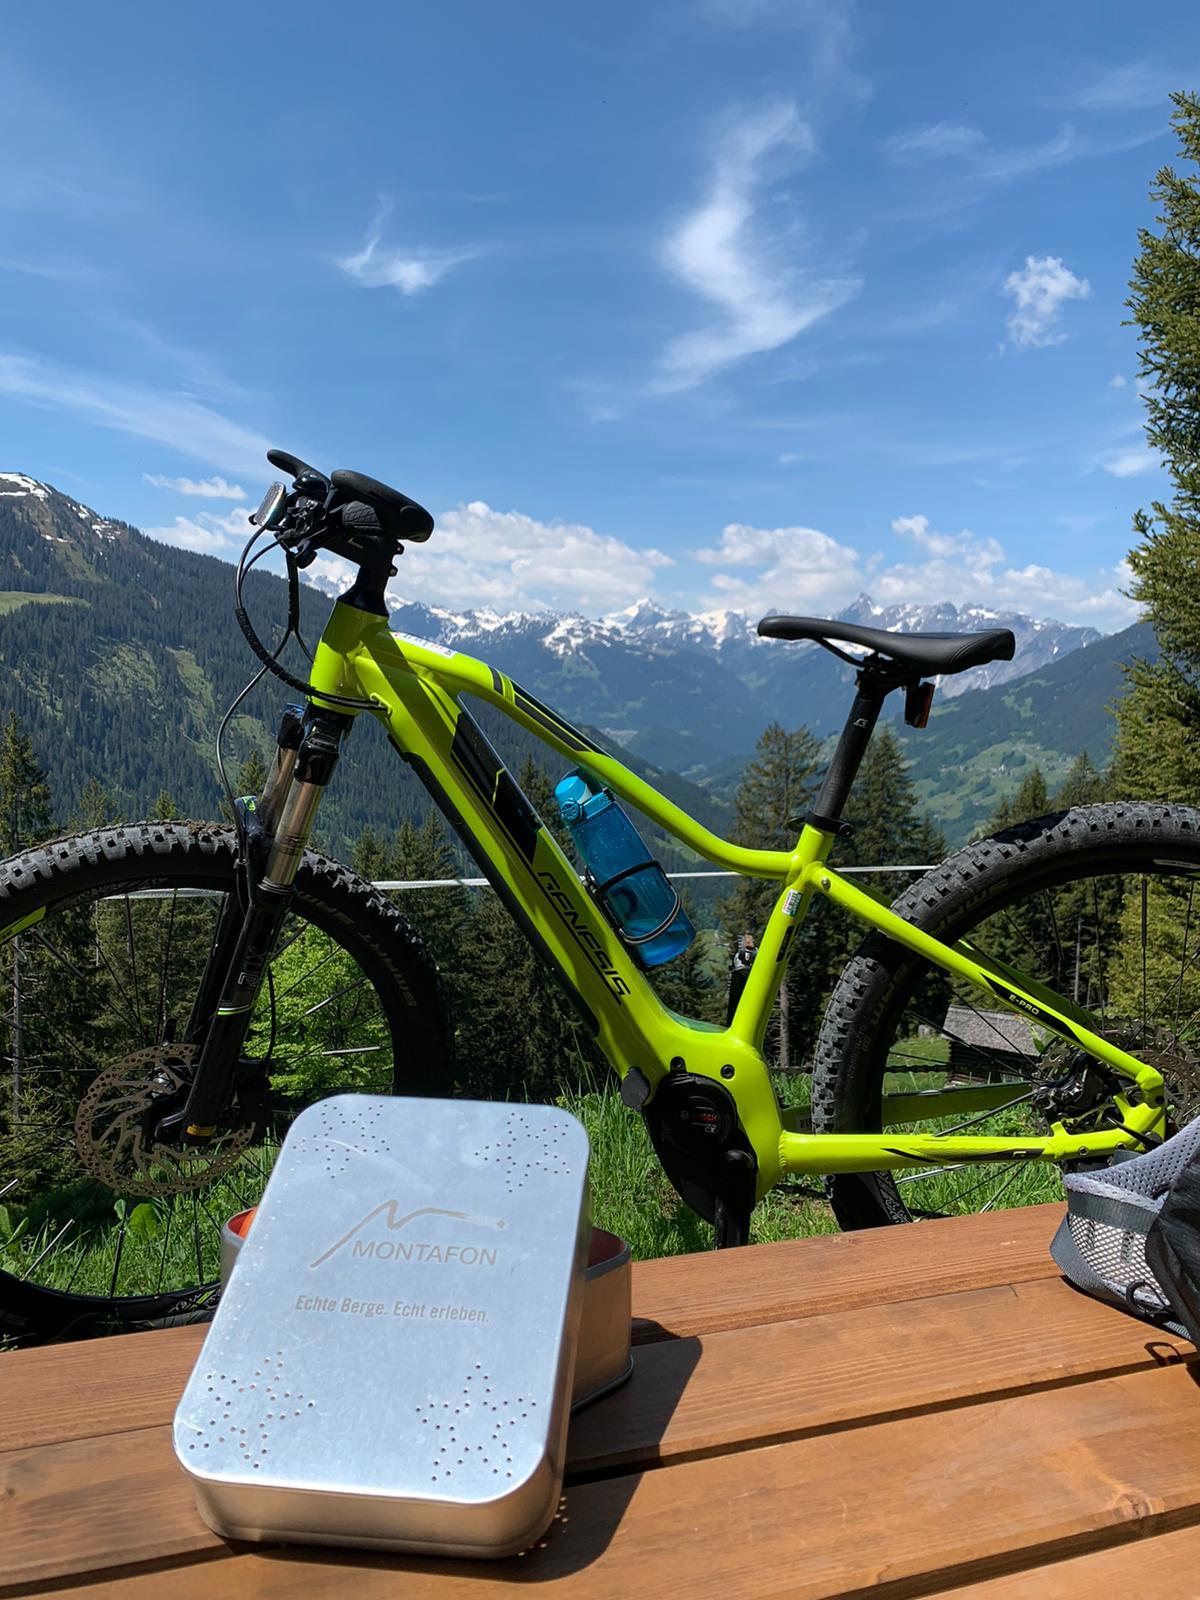 fritzensee, bike&hike montafon, bartholomäberg, kristberg, Silbertal